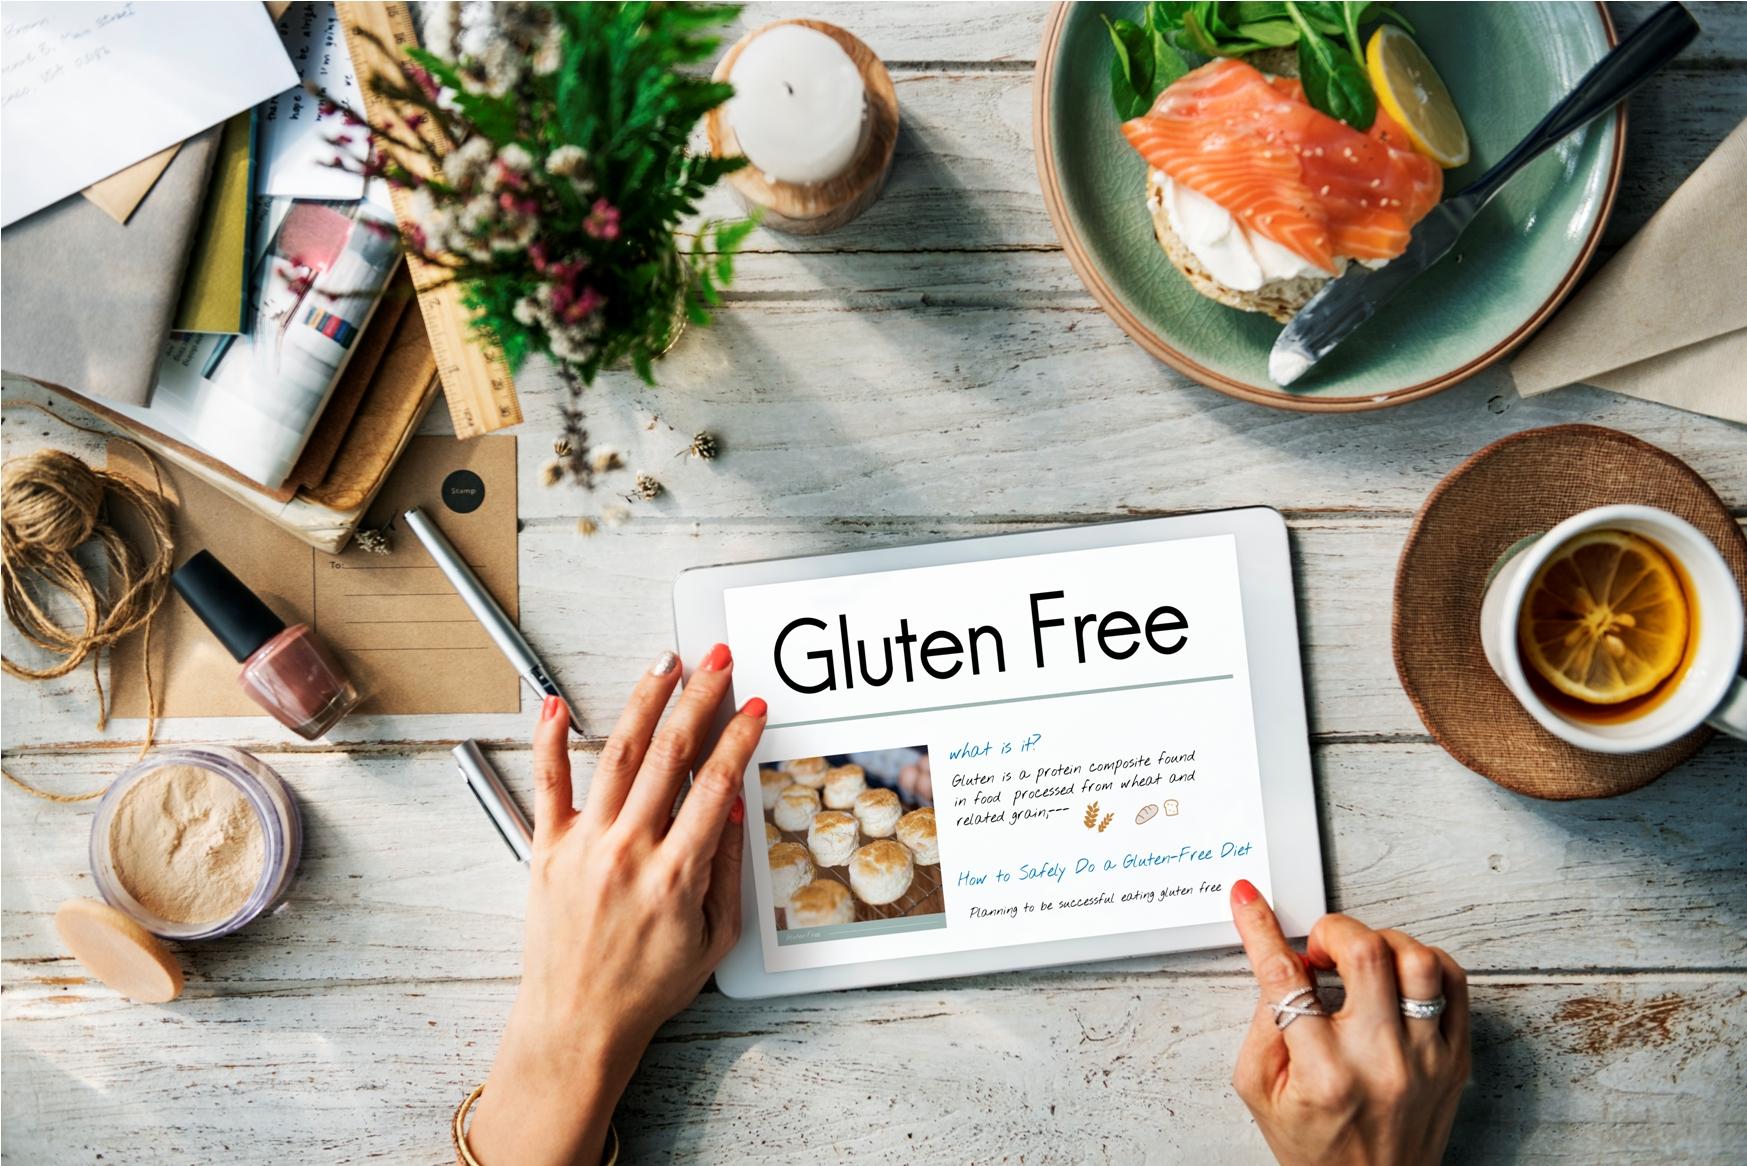 Glutein Free Celiac Disease